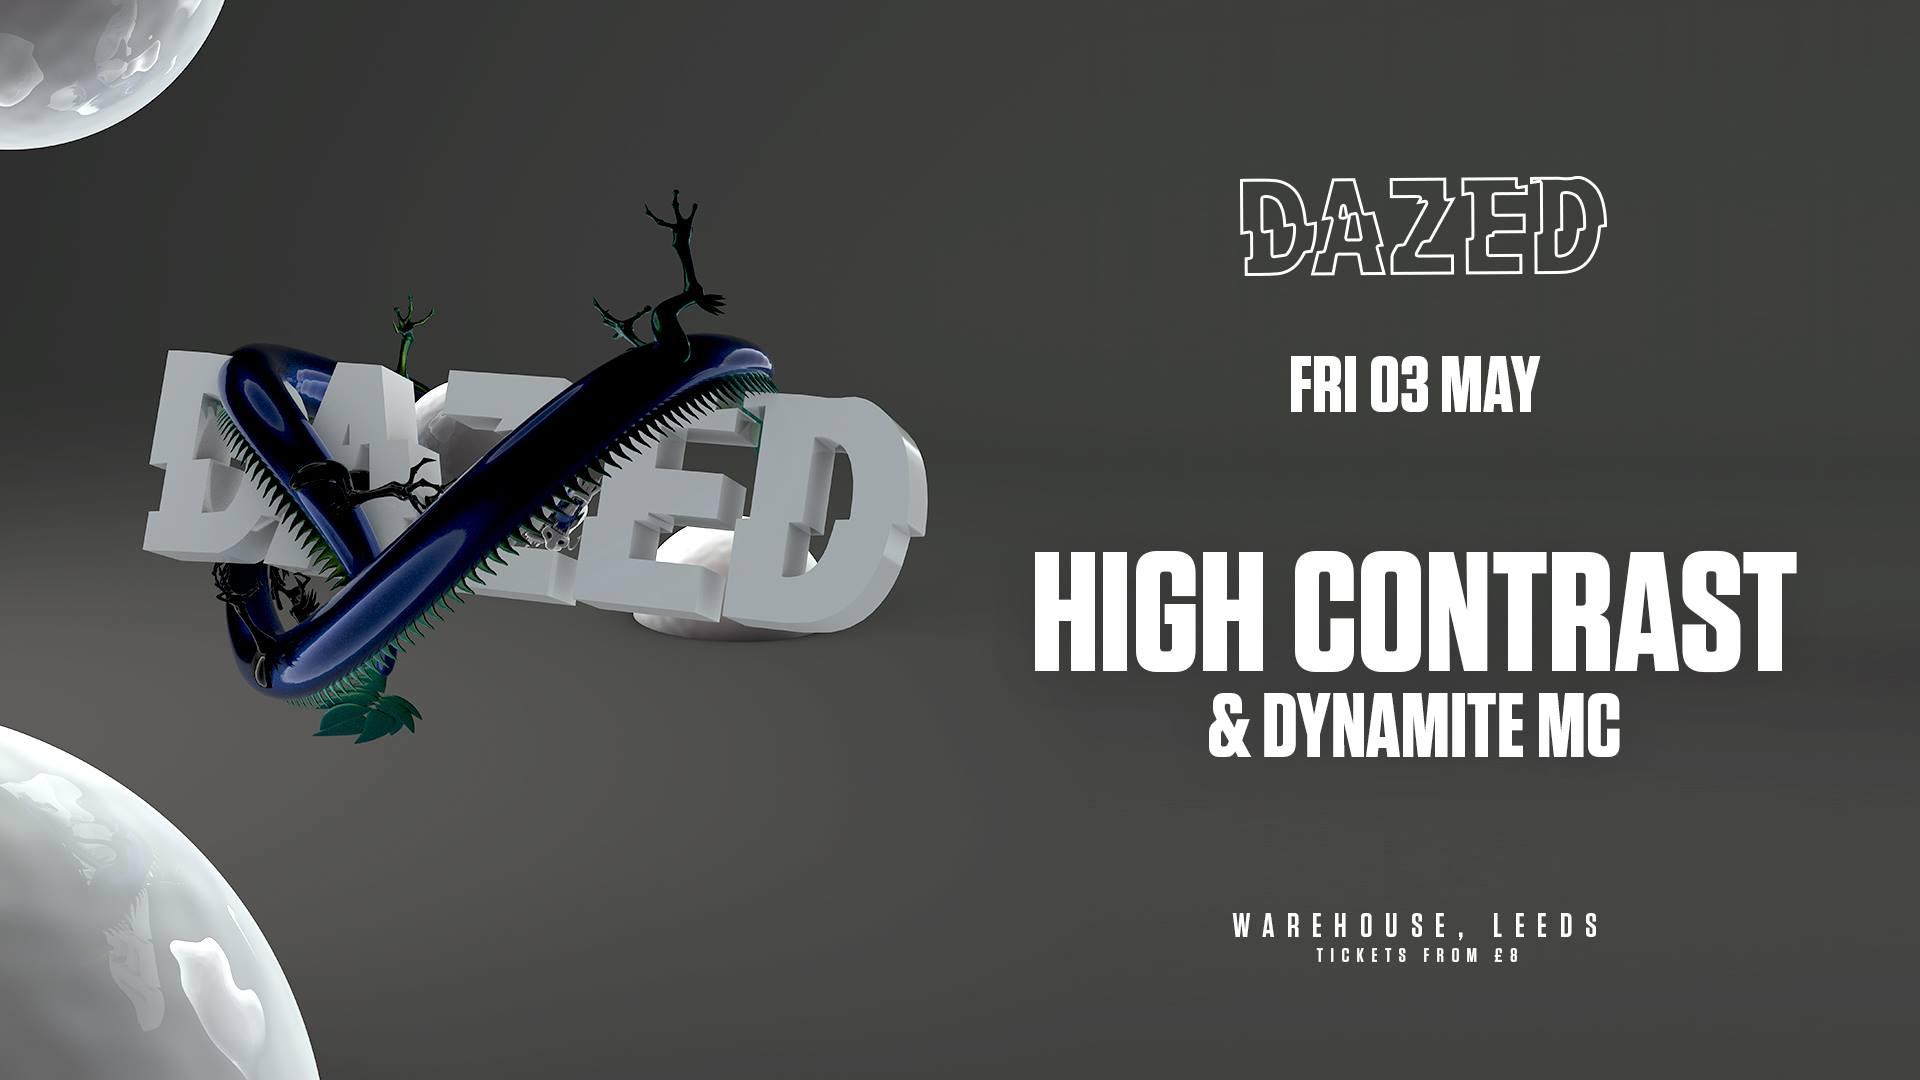 Dazed Presents: High Contrast & Dynamite MC